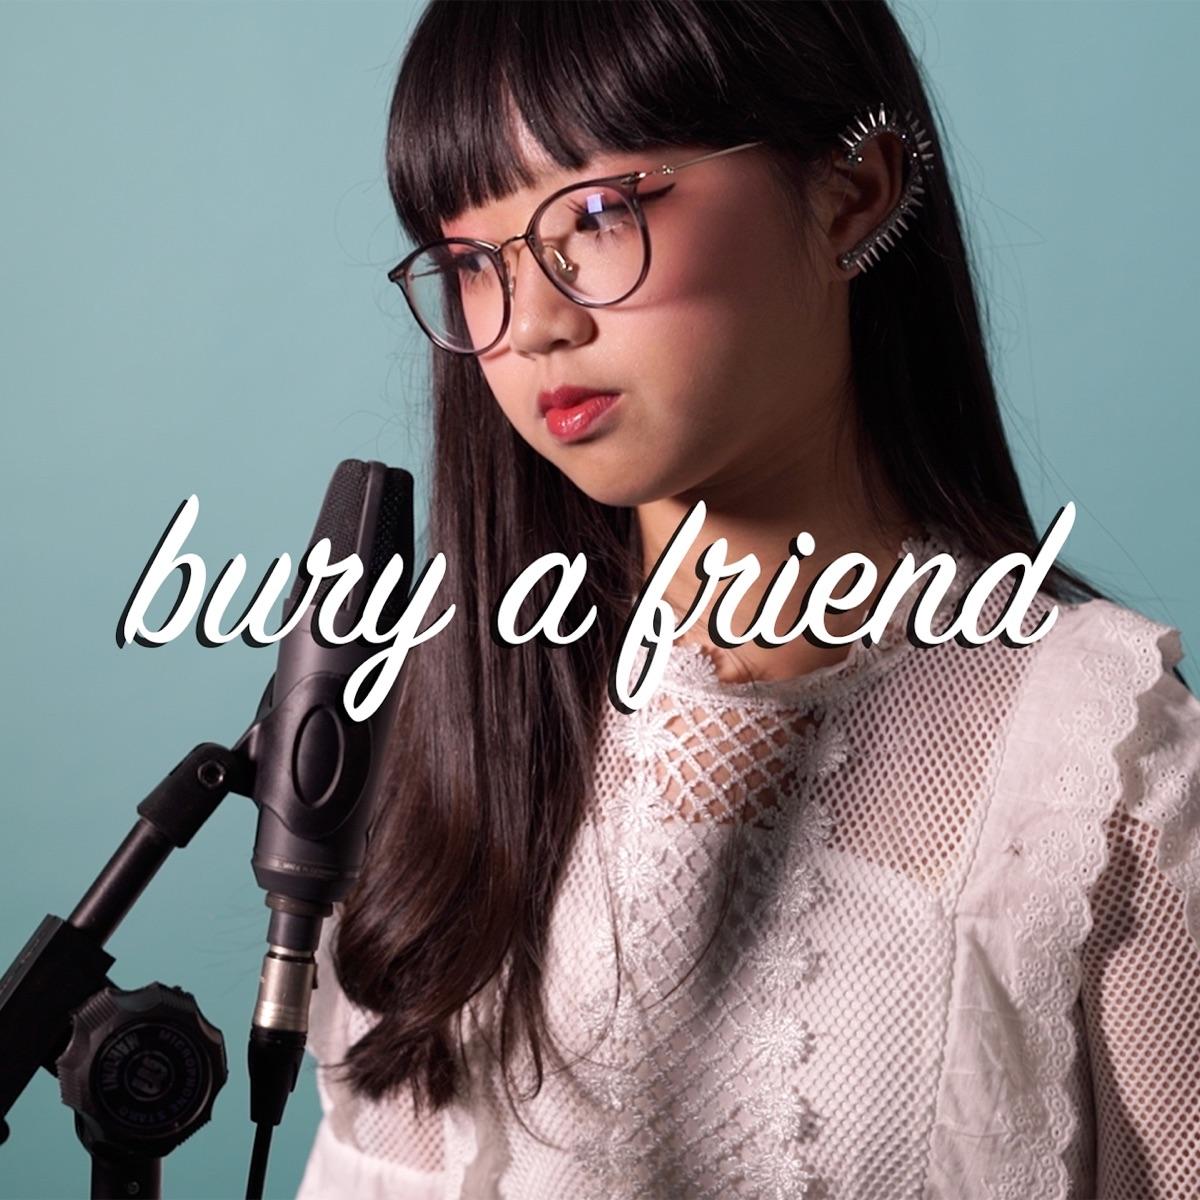 Bury a Friend - Single Kim CD cover